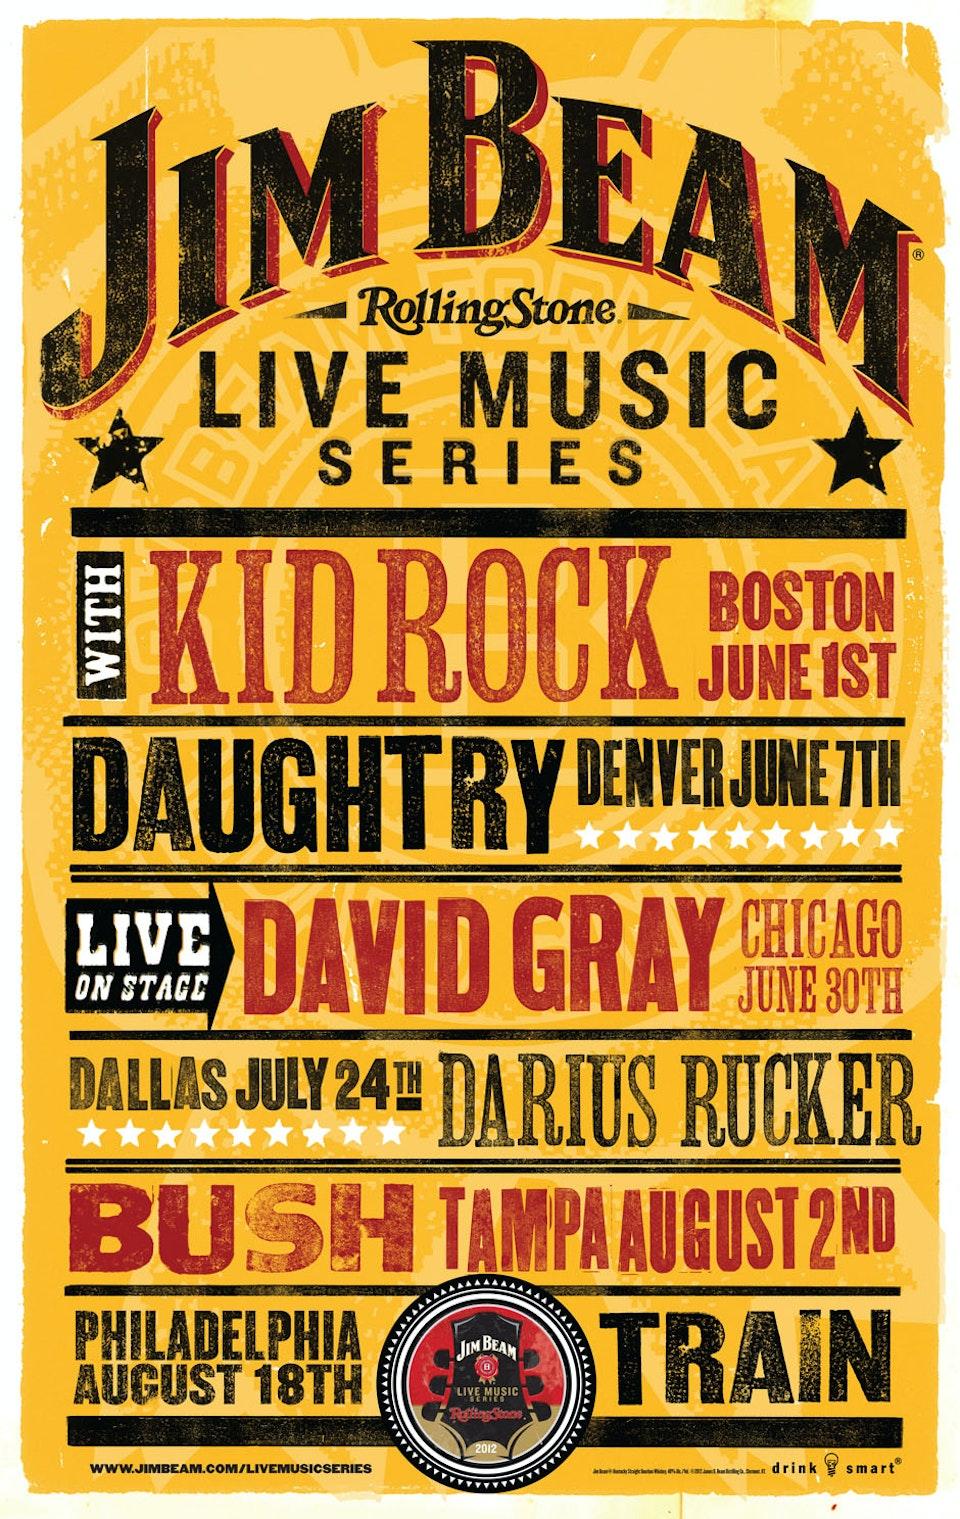 Jim Beam Concert Series Poster - Final poster